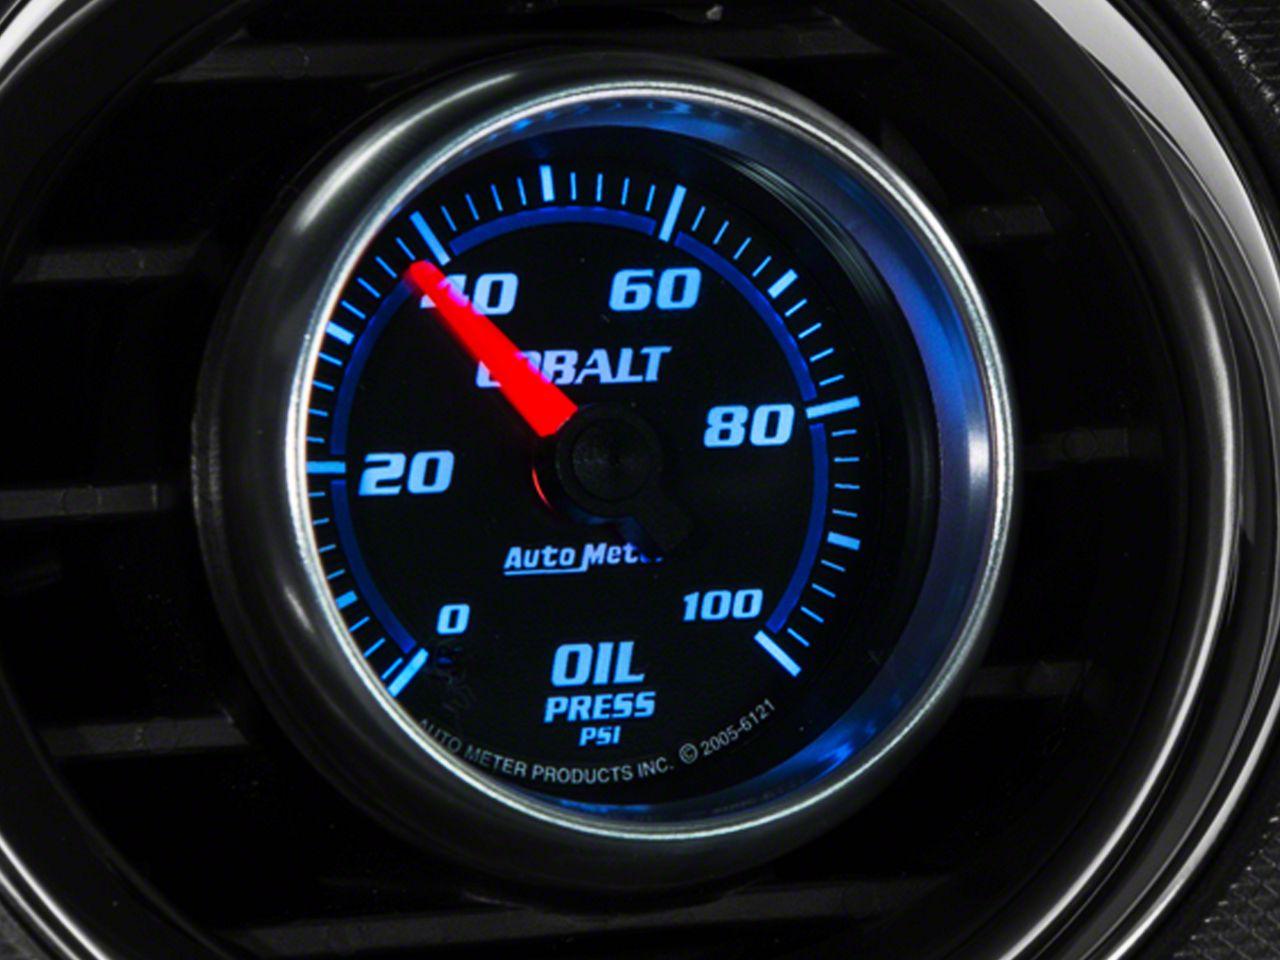 Auto Meter Cobalt Oil Pressure Gauge - Mechanical (08-19 All)